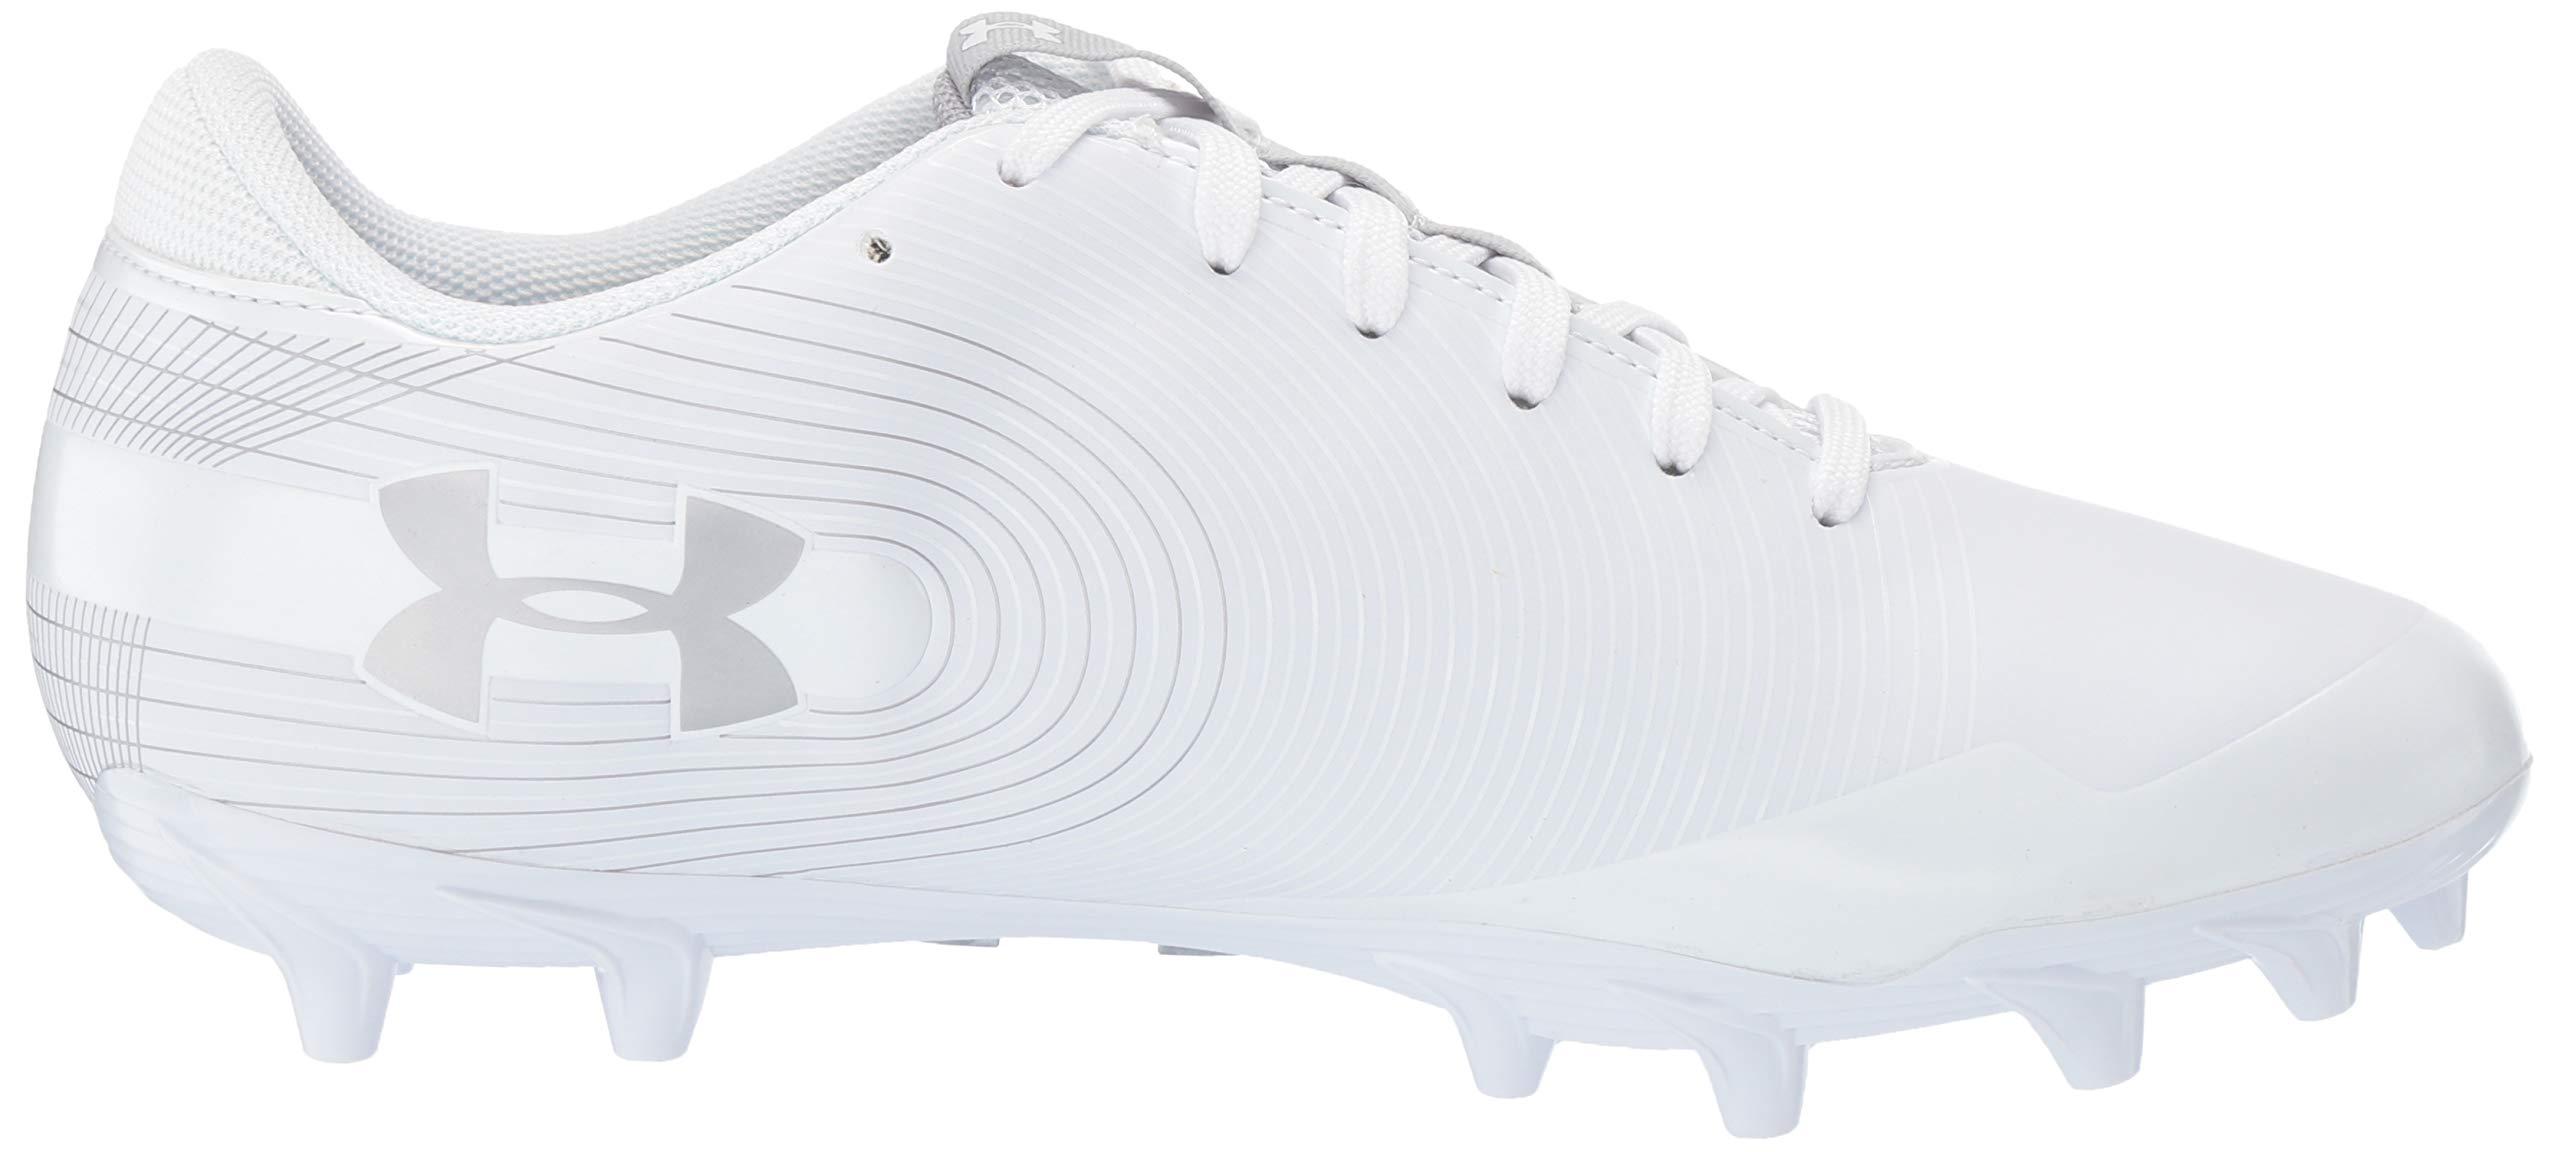 Under Armour Men's Speed Phantom MC Football Shoe, White/White, 7.5 M US by Under Armour (Image #6)